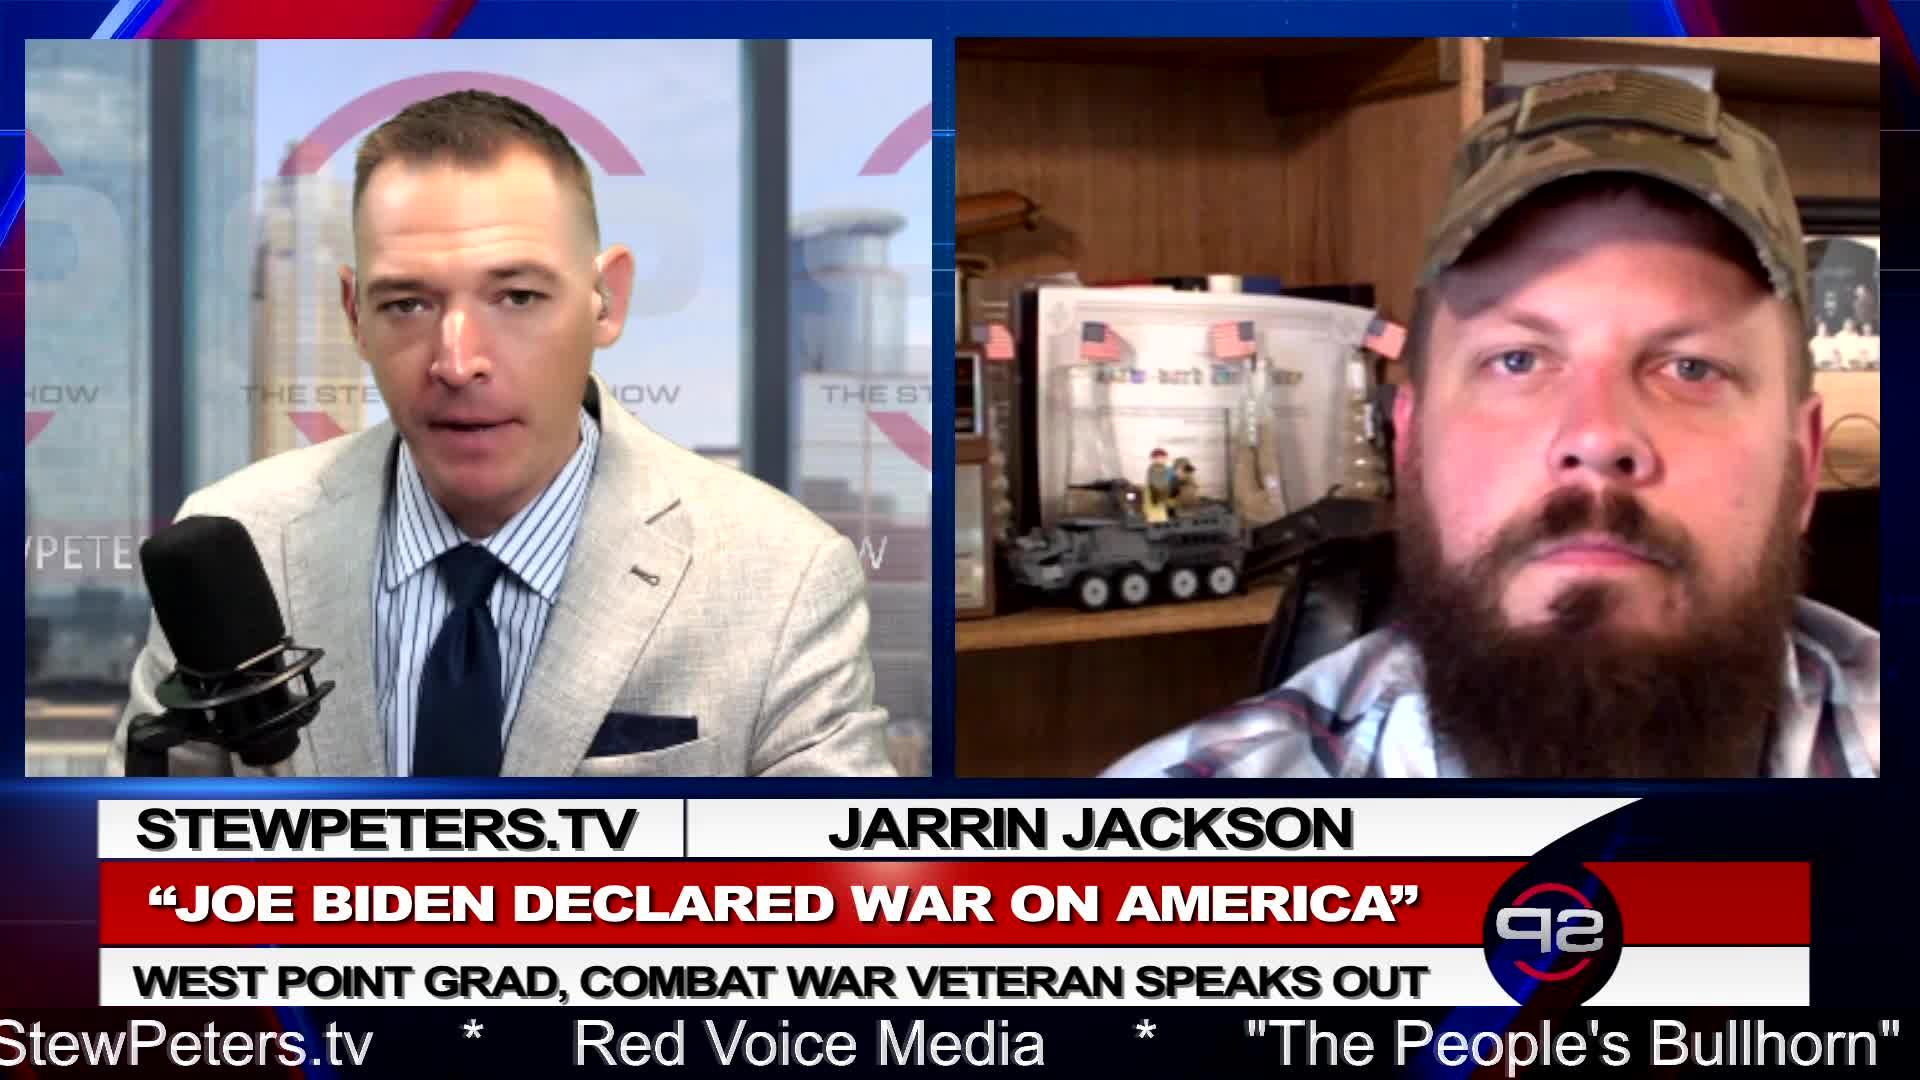 New Stew Peters – Brass Tacks! – Joe Biden Has Declared War On America! The Real Insurrection! – Must Video